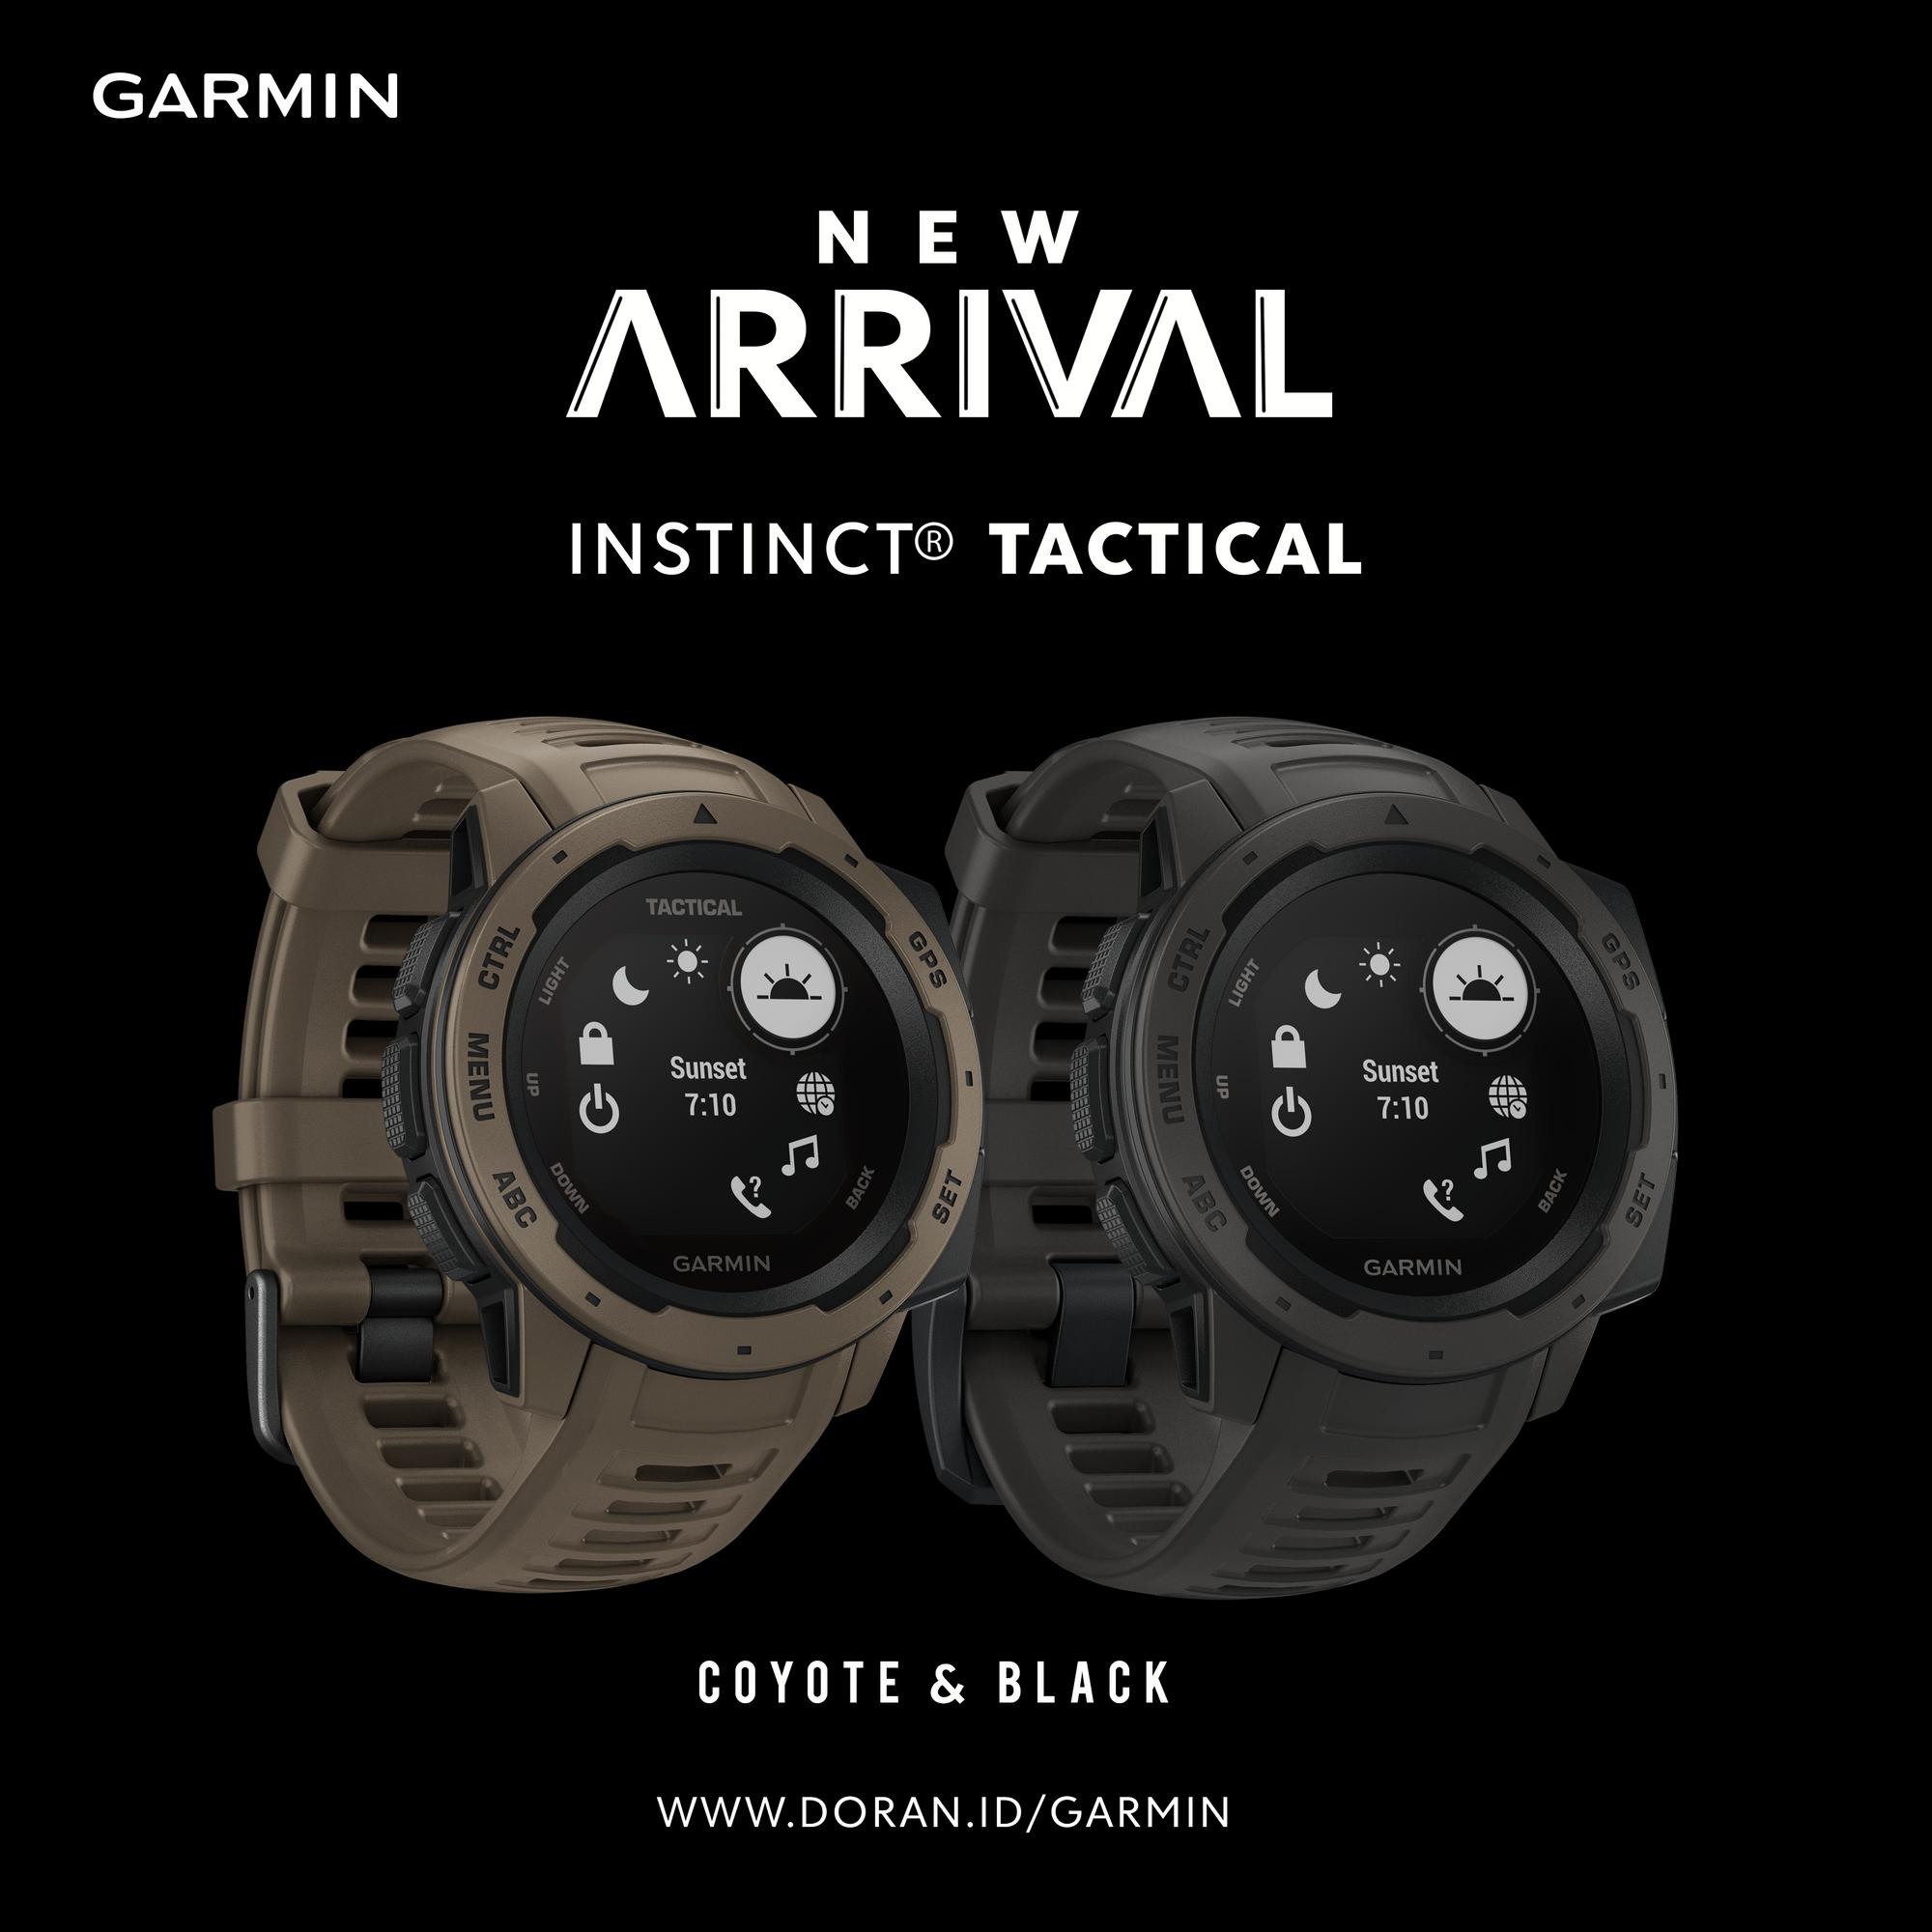 Introducing Garmin Instinct Tactical Edition Shop At Link In Bio Garmininstinct Garmin Dorangadget Garmini Garmin Fitness Military Watches Garmin